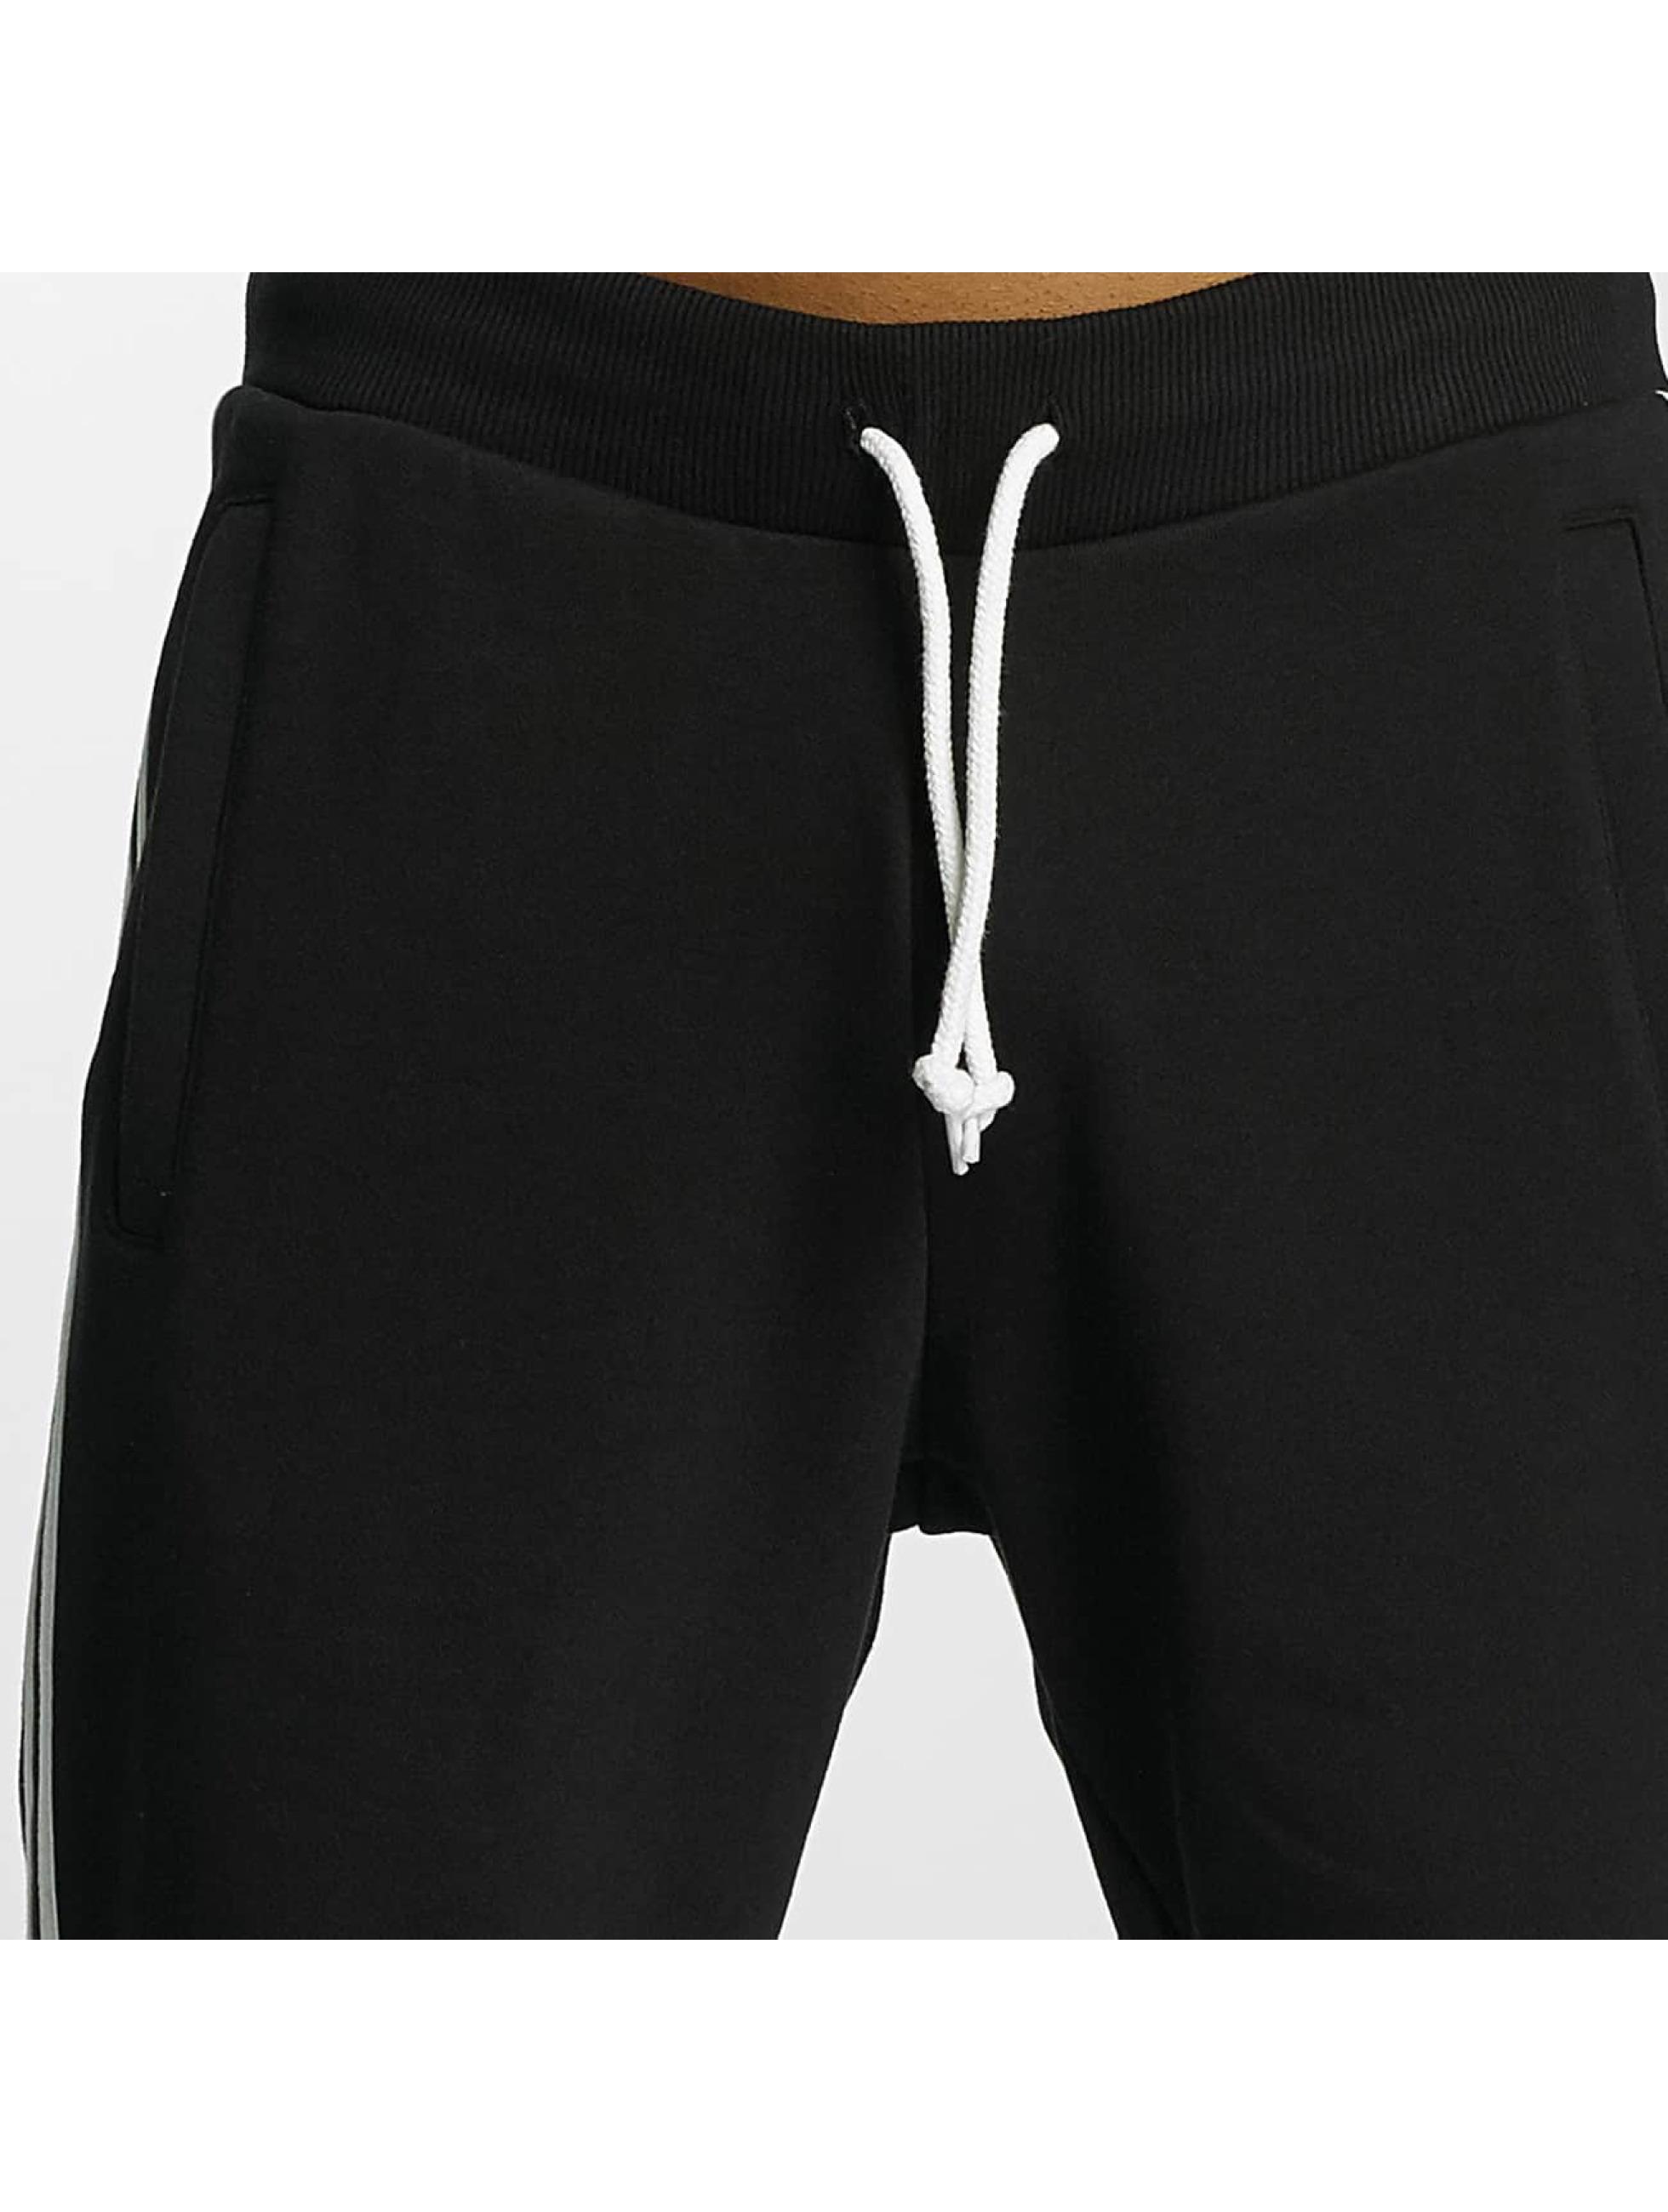 adidas Short 3 Striped black